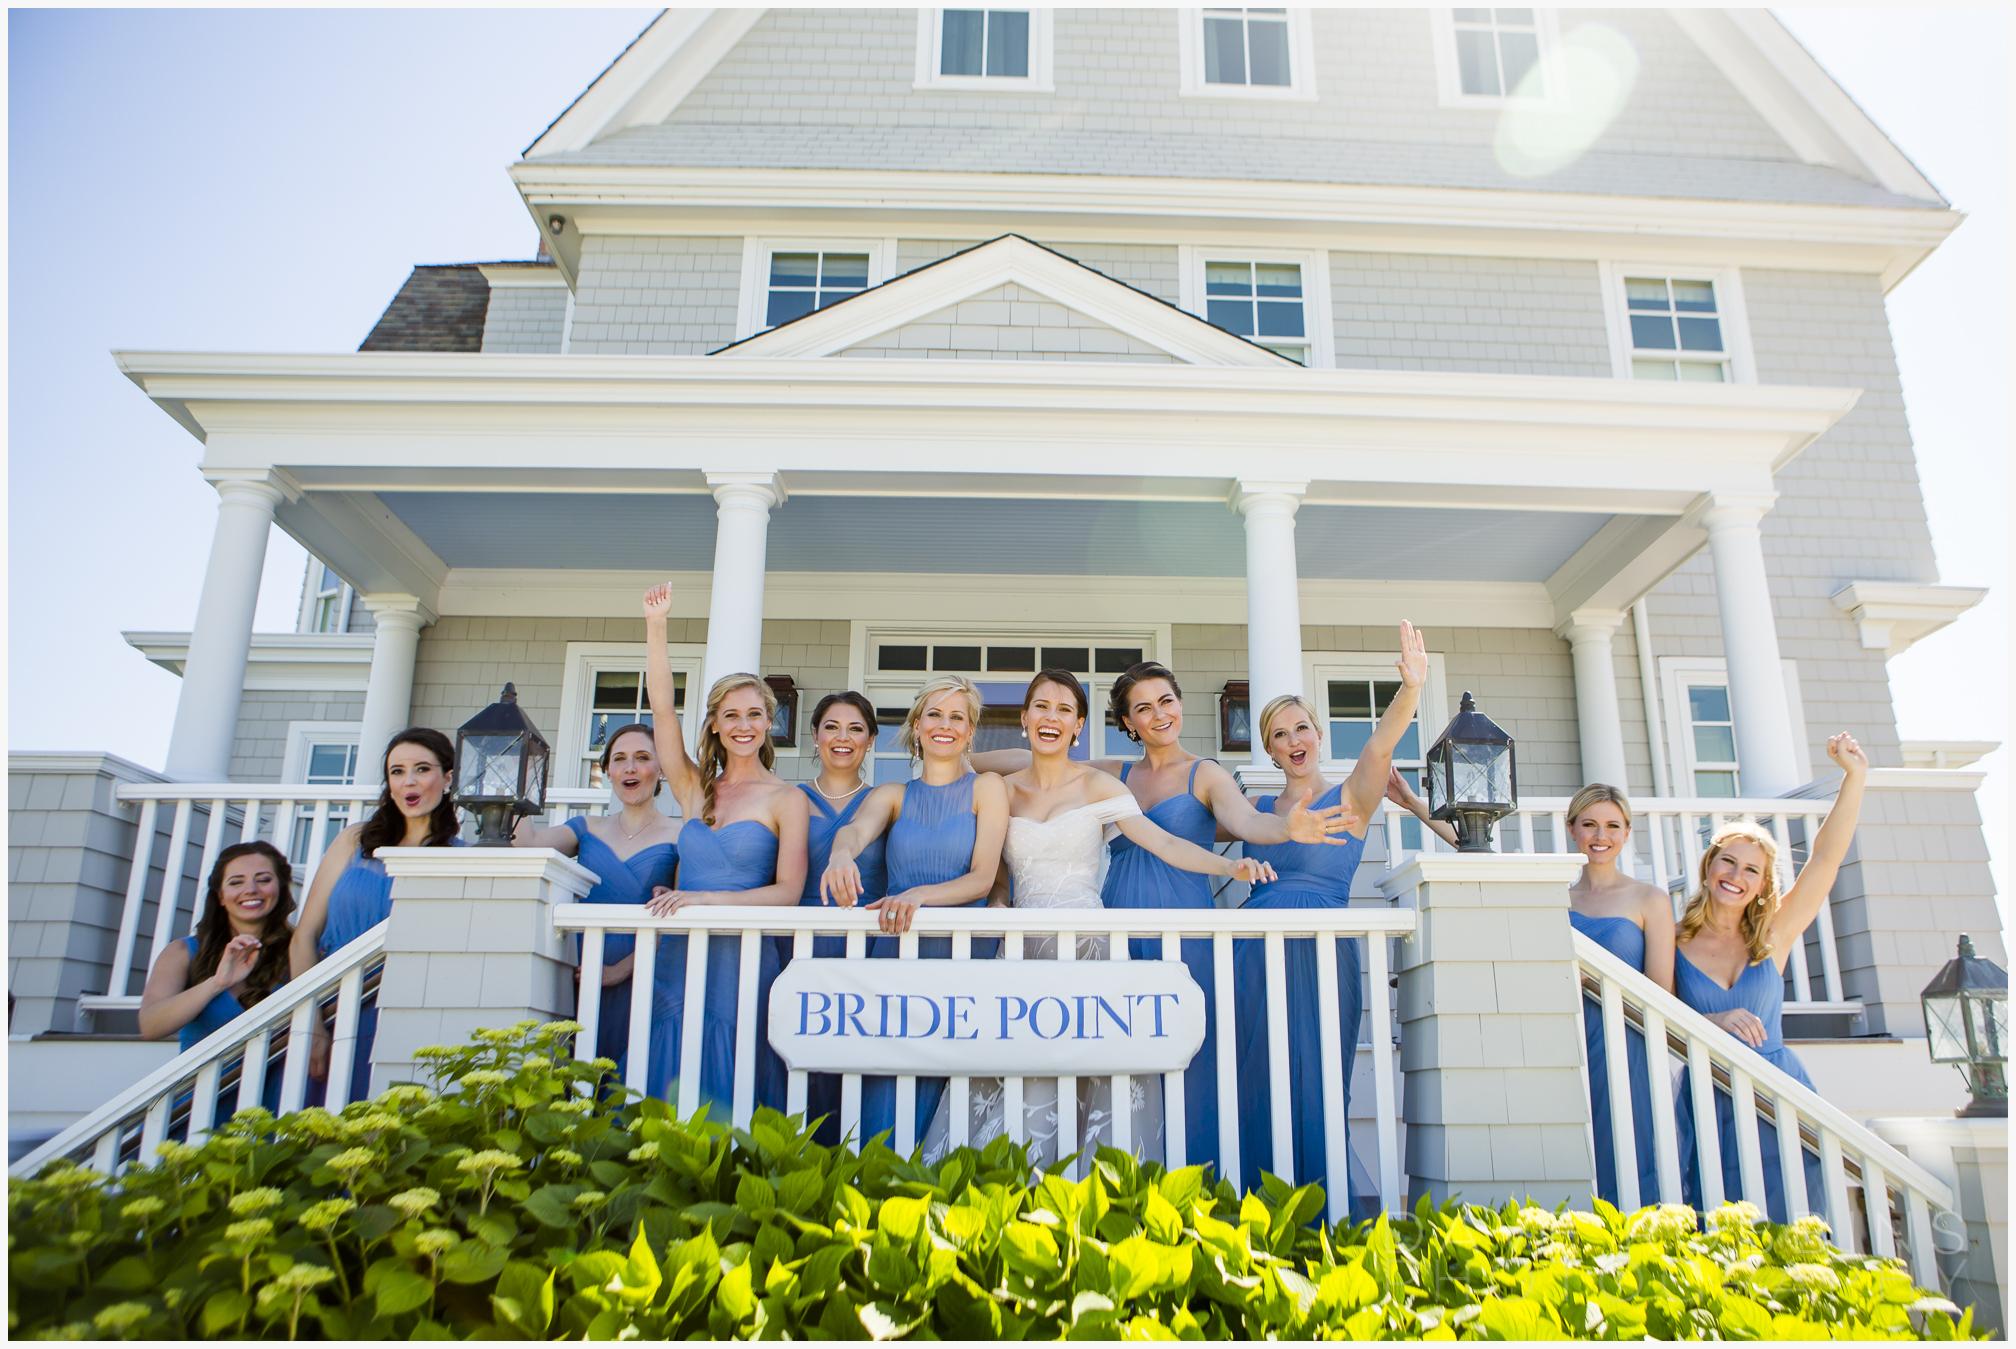 THE OCEAN HOUSE WEDDING 0015.JPG